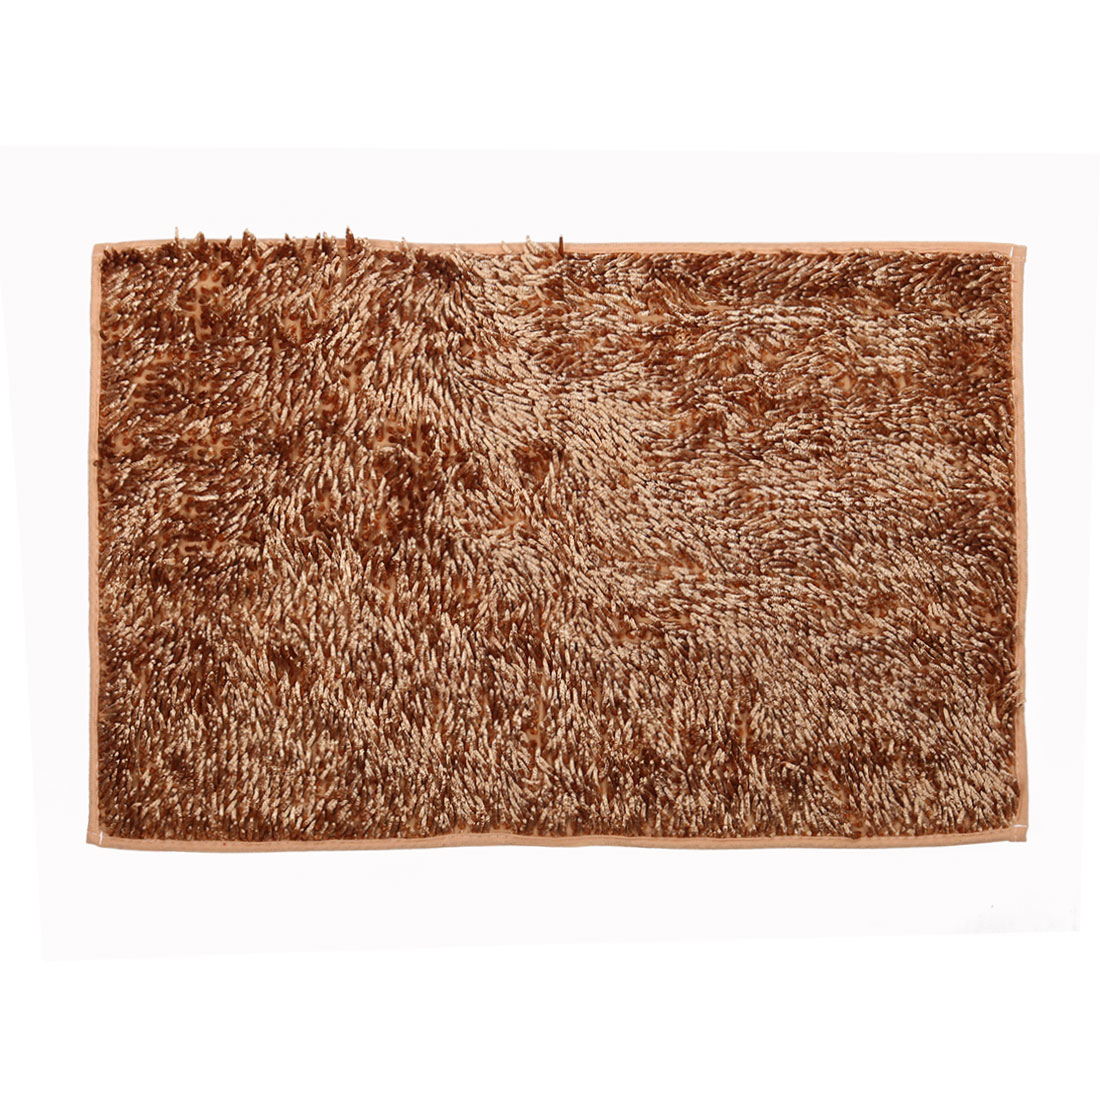 Bathroom Slip Resistant Absorbent Carpet Bath Rug Mat Light Brown 32 x 20 Inches